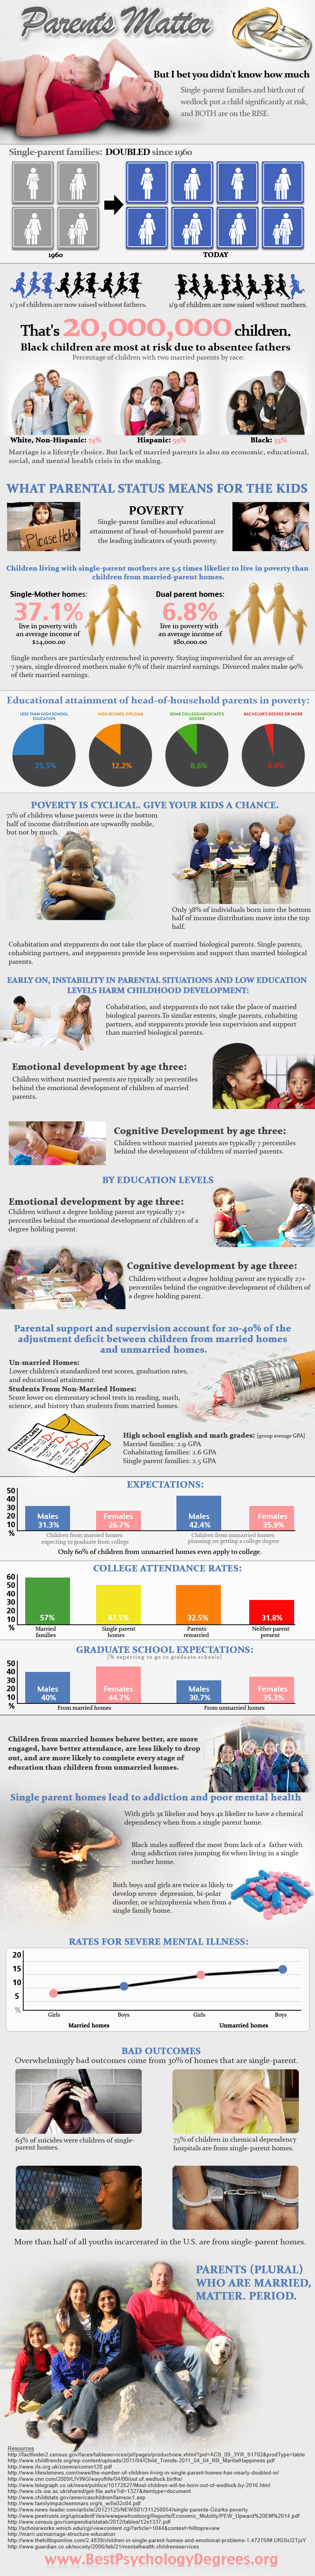 parents-matter